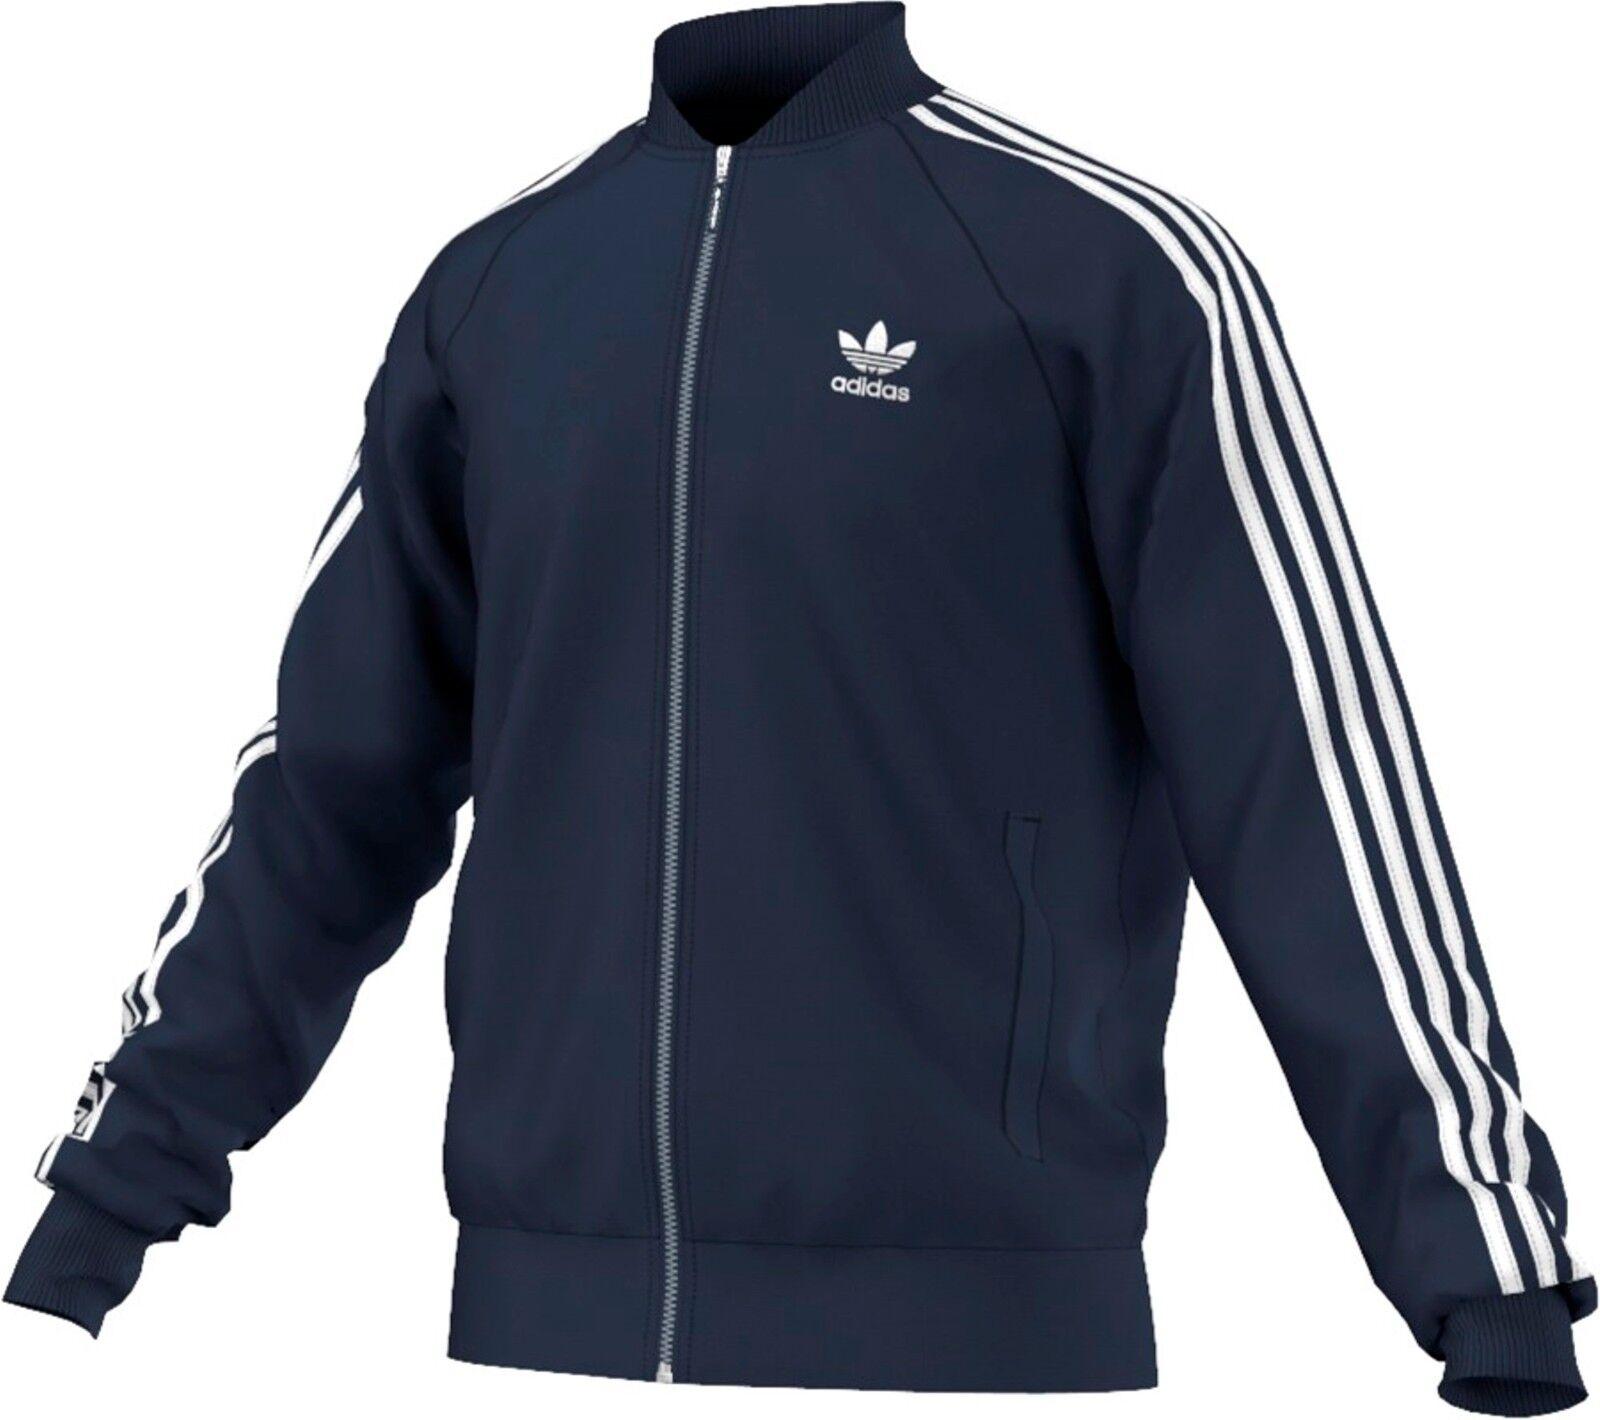 Adidas Originals Superstar Longsleeve hombre 's Track chaqueta leyenda tinta